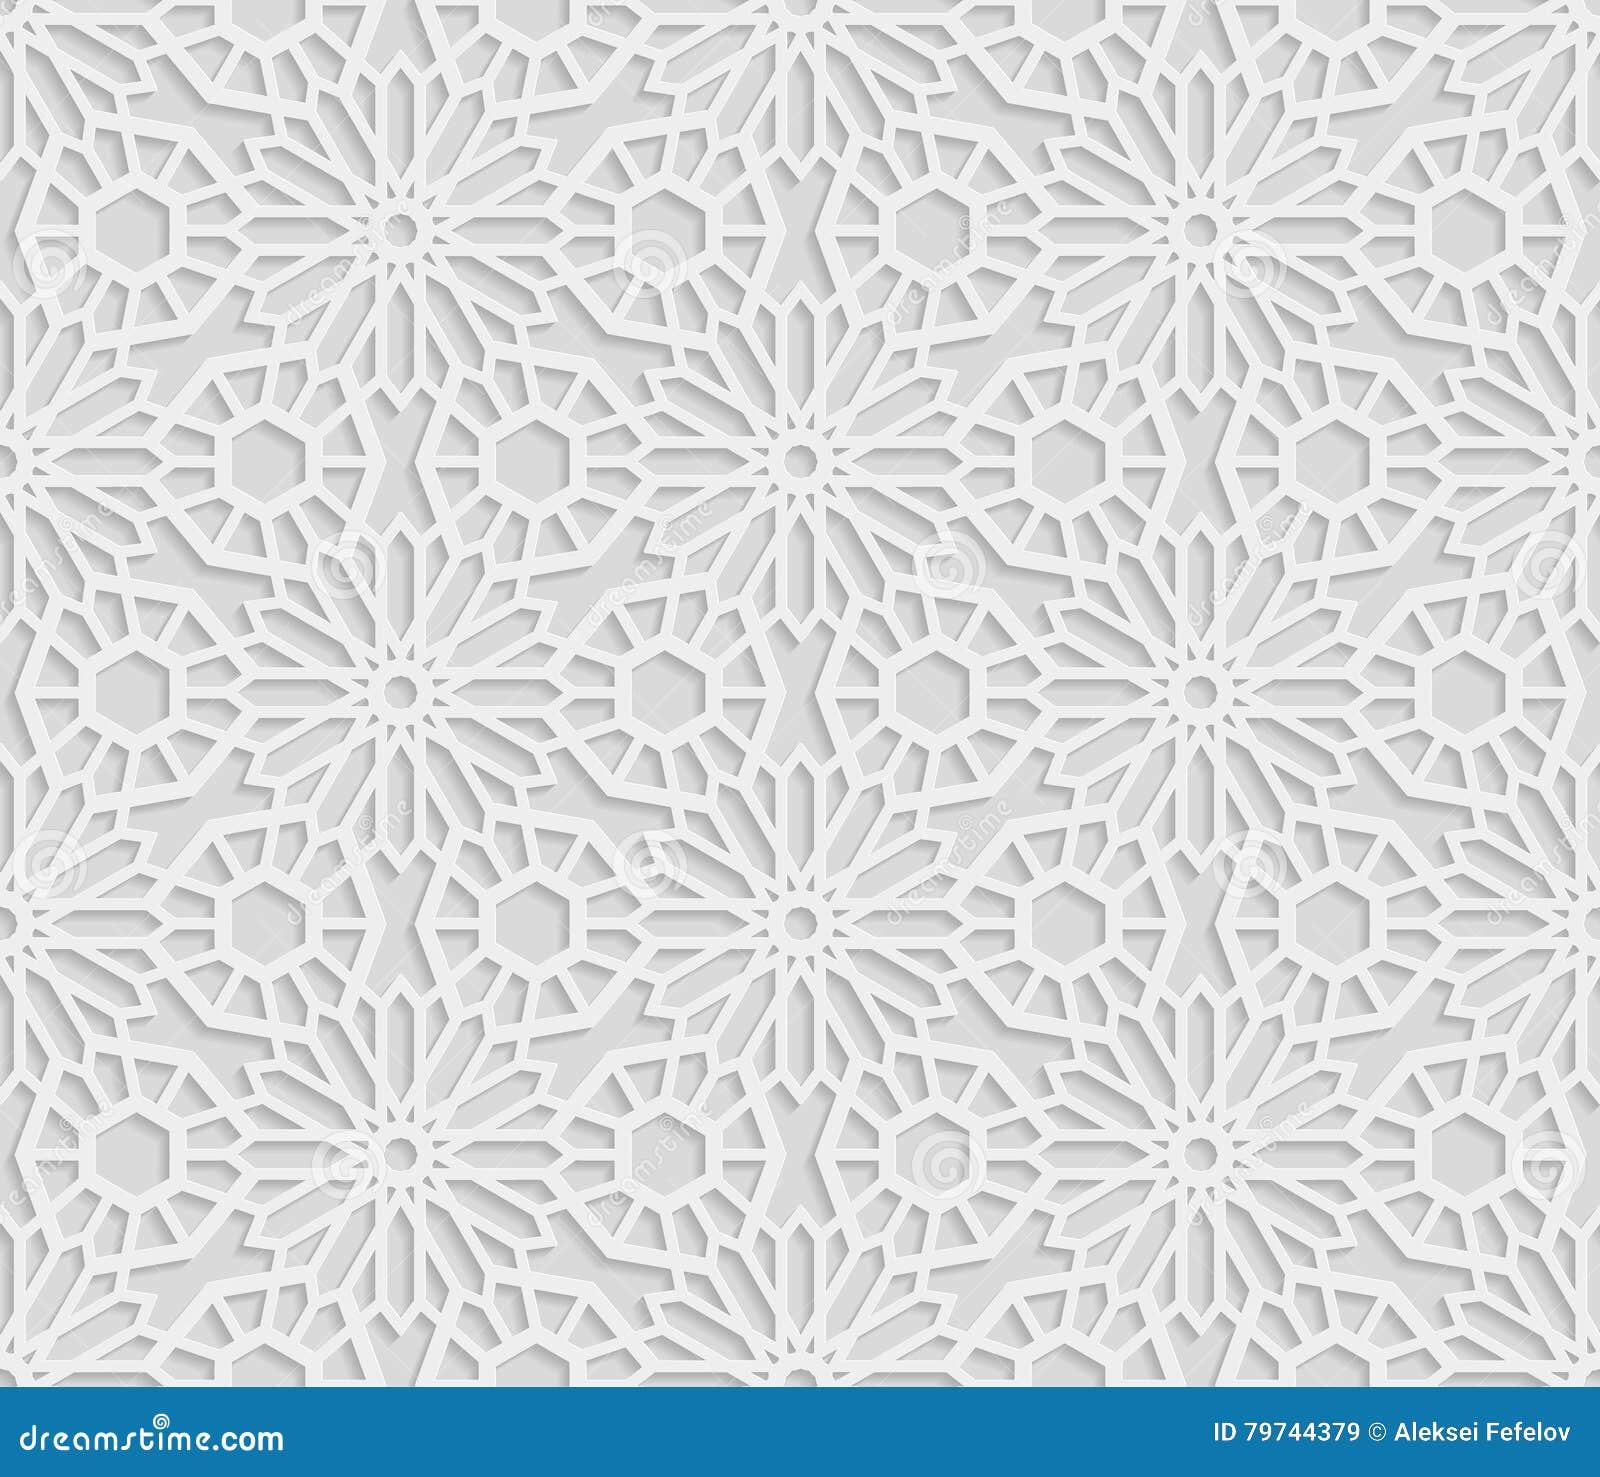 Seamless arabic geometric pattern, 3D white pattern, indian ornament, persian motif, vector. Endless texture